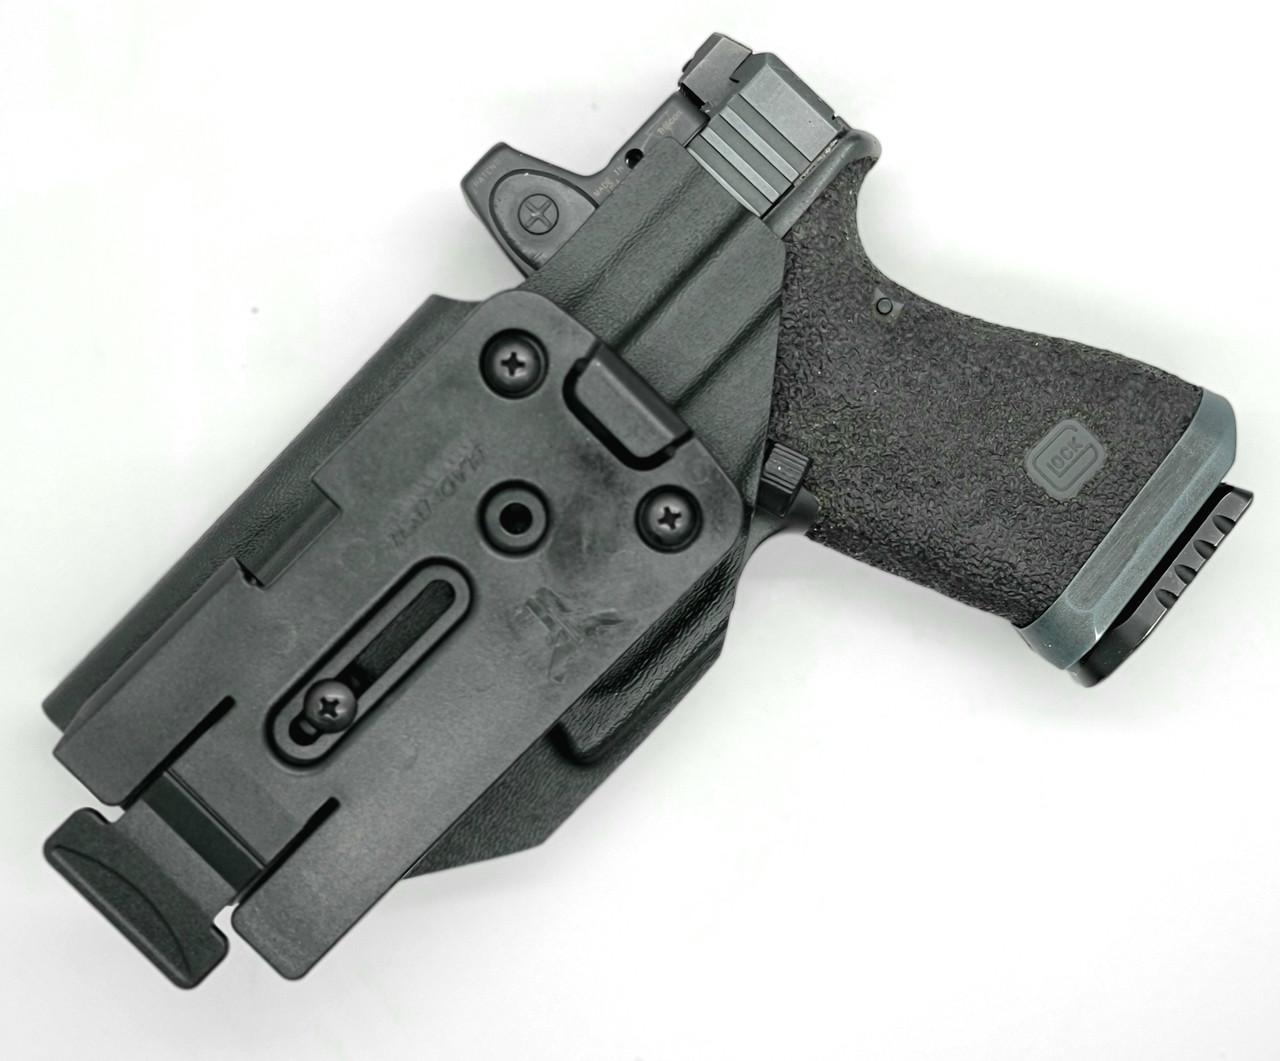 Bladetech TMMS (Tactical Modular Mount System) Holster